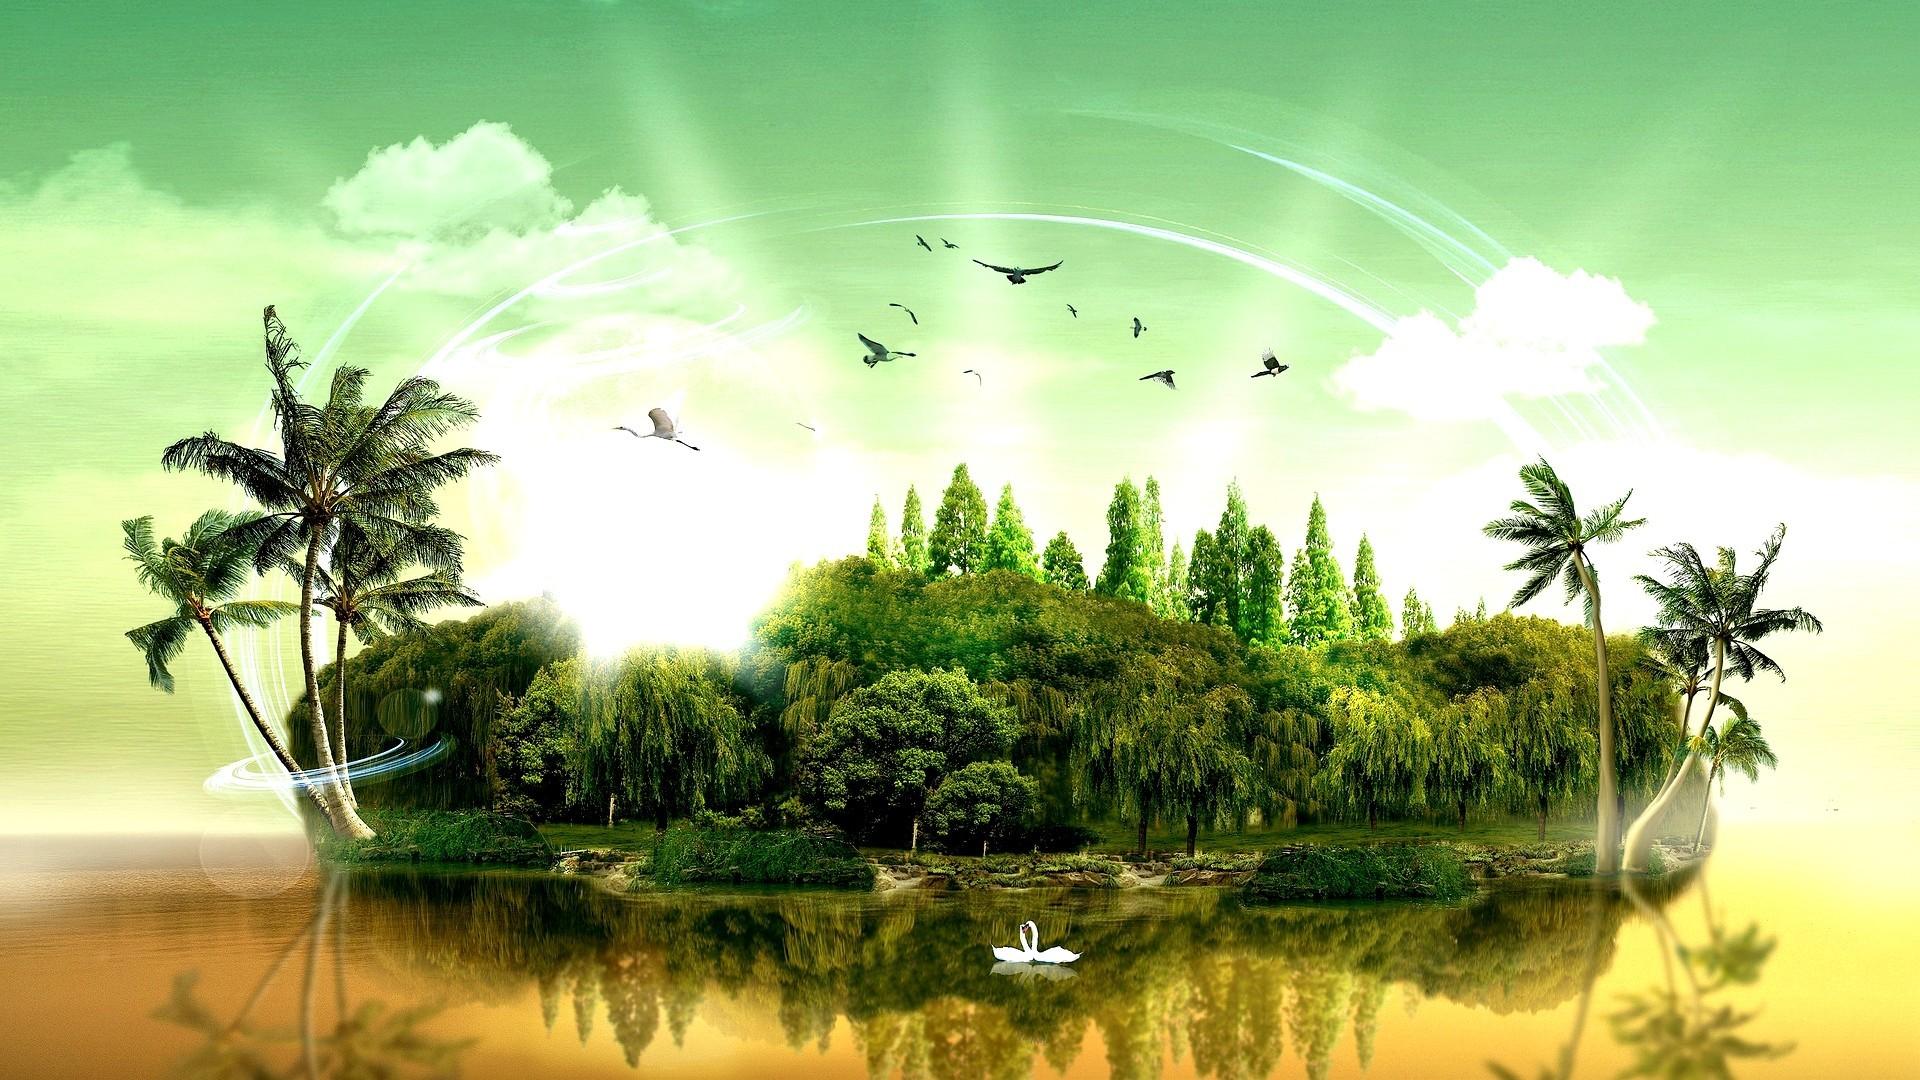 fantasy island palm trees desktop wallpaper | ololoshenka | Pinterest |  Fantasy island, Palm and Wallpaper